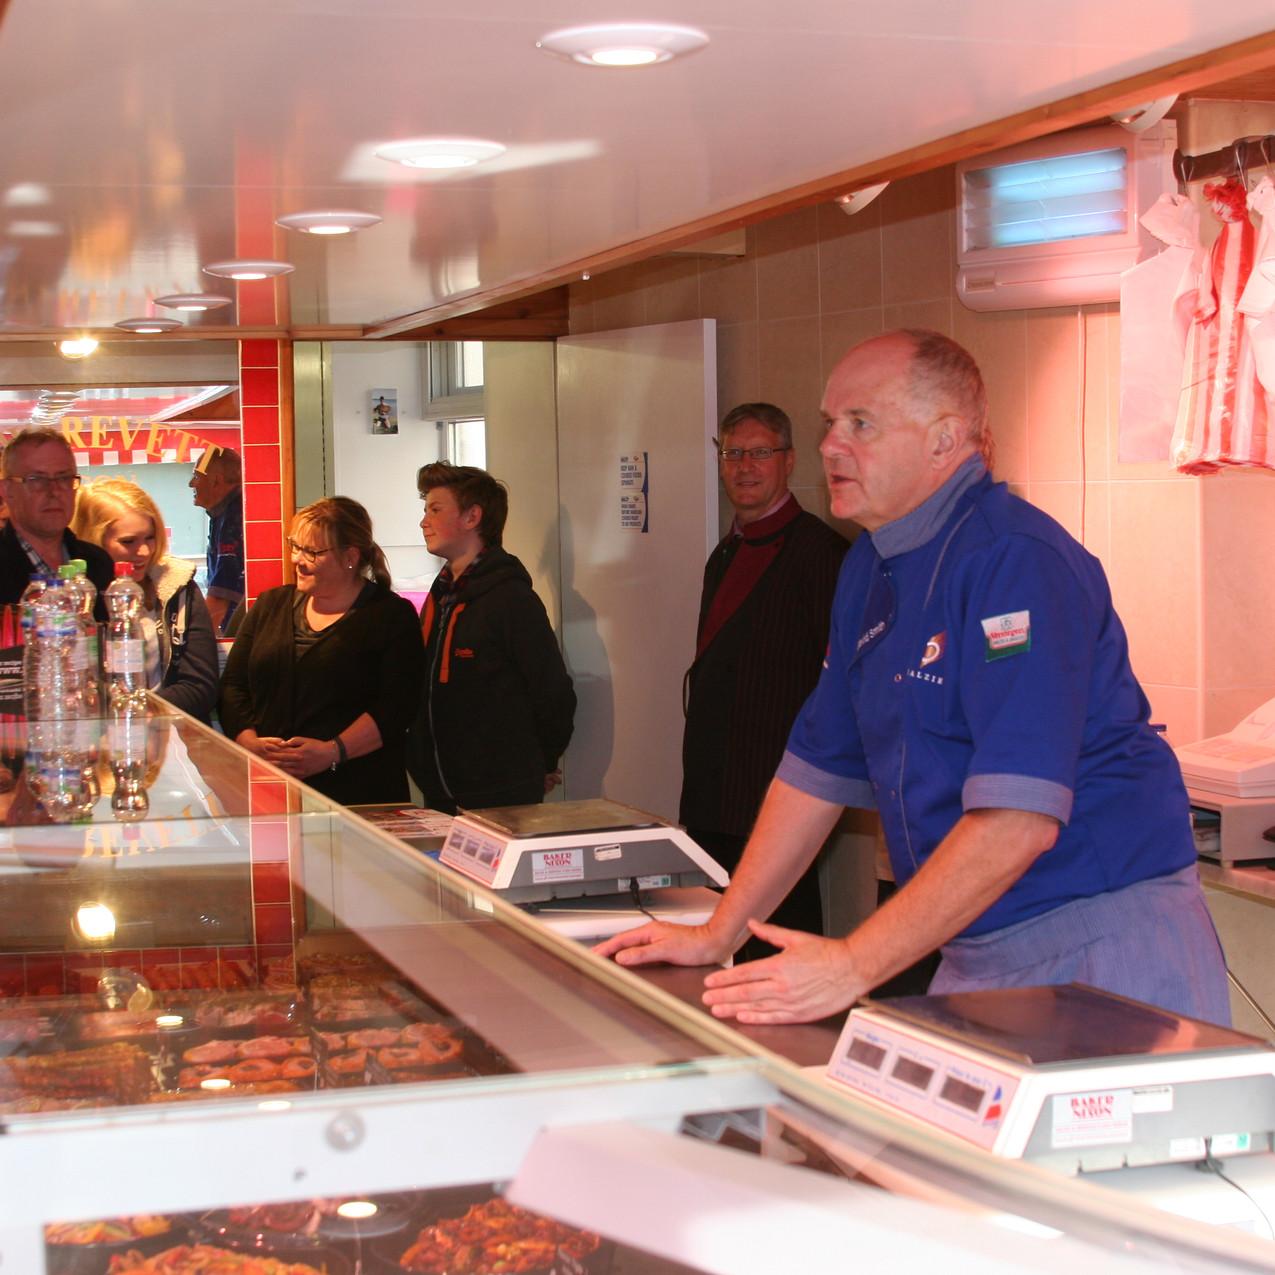 An expert teaches the local butchers